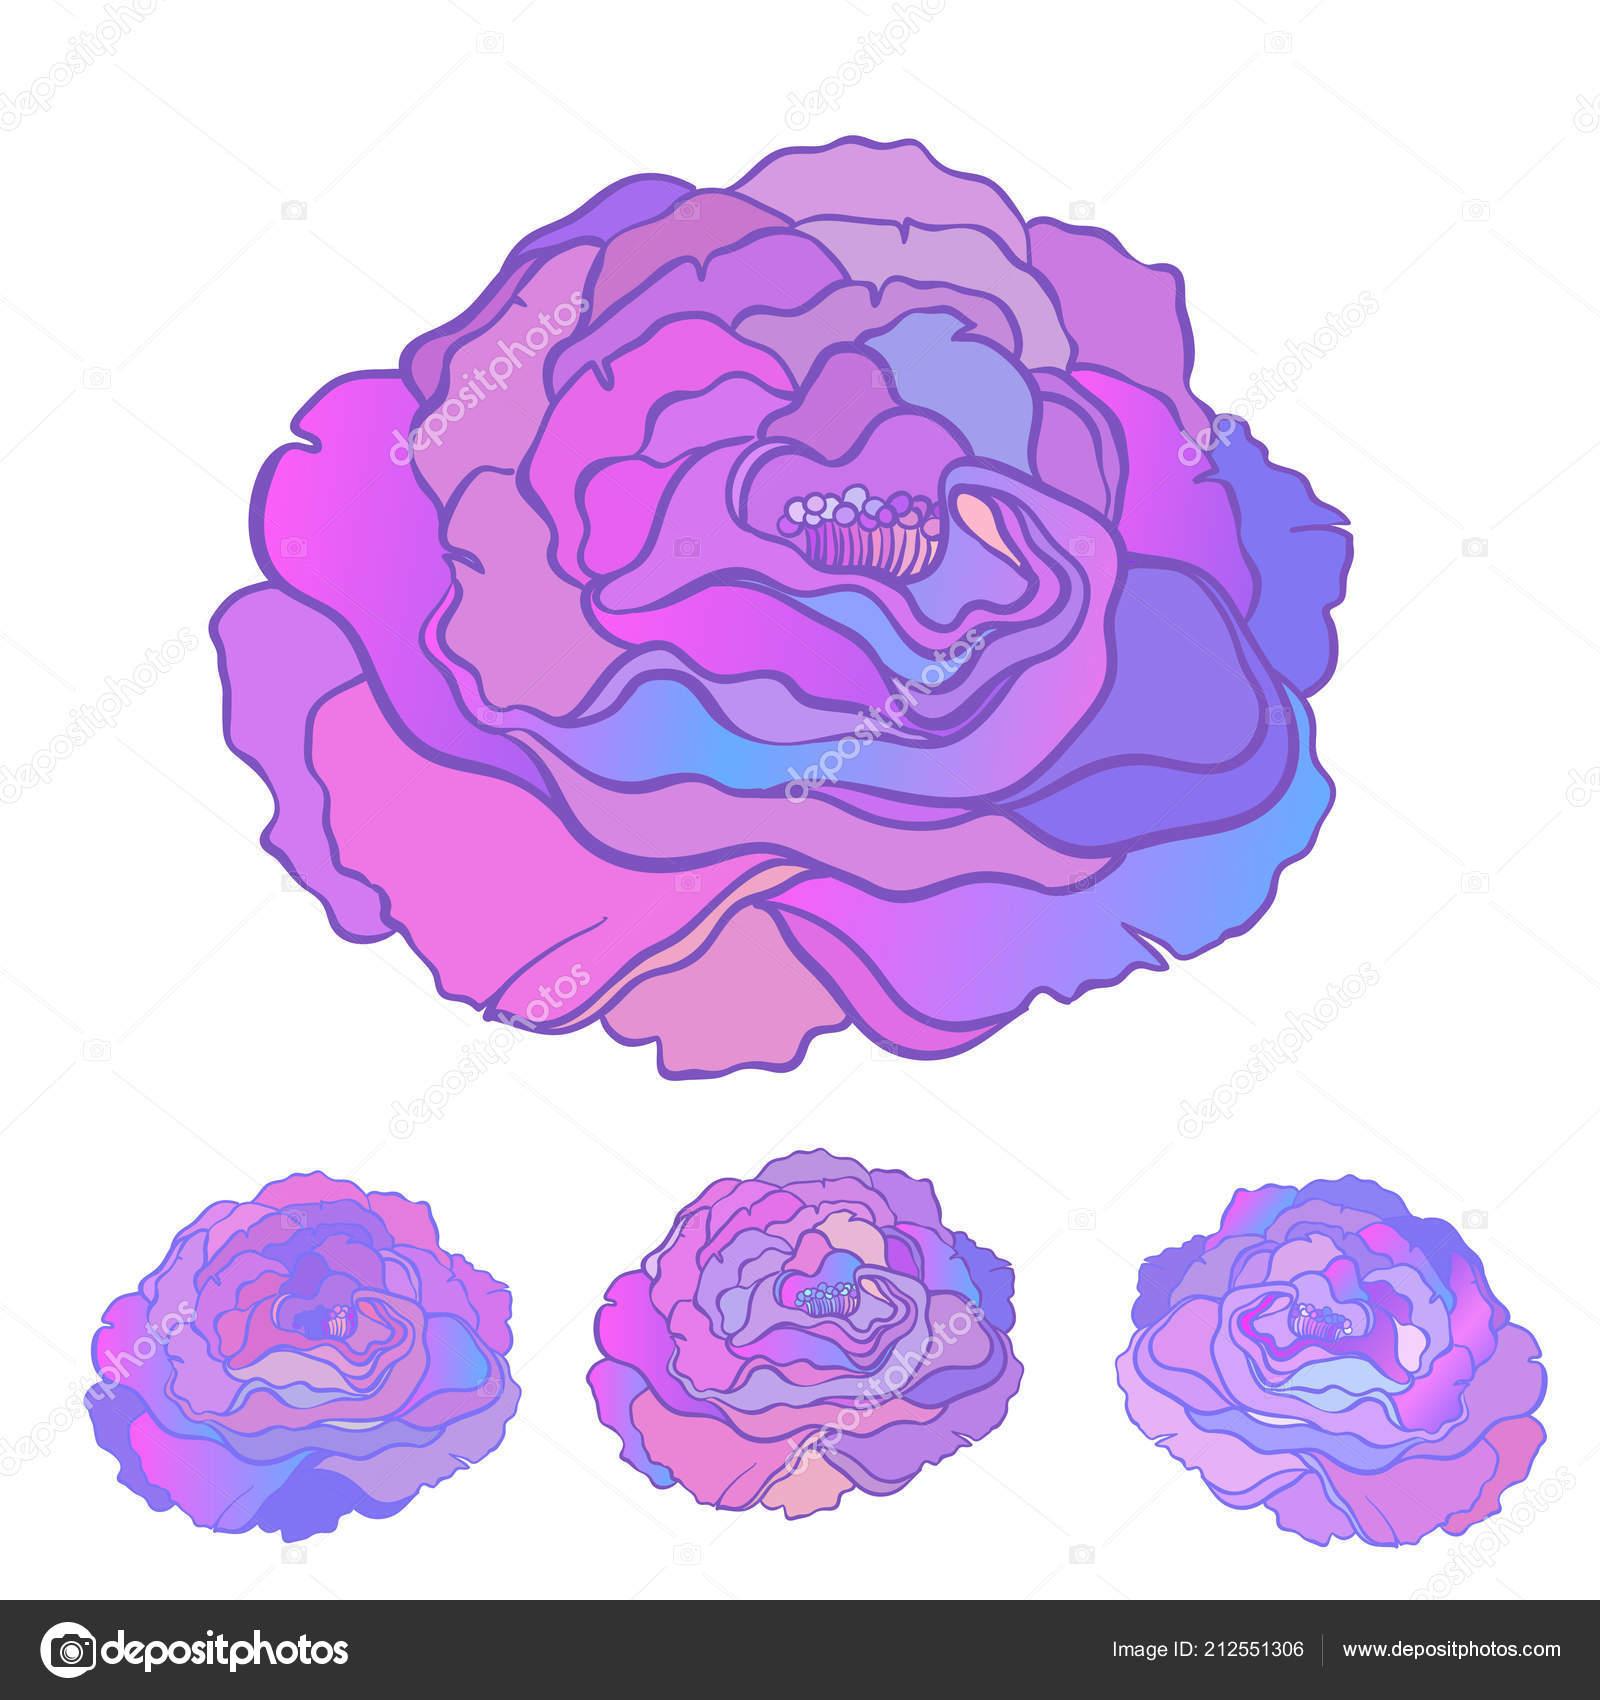 depositphotos stock illustration rose flower tattoo style isolated